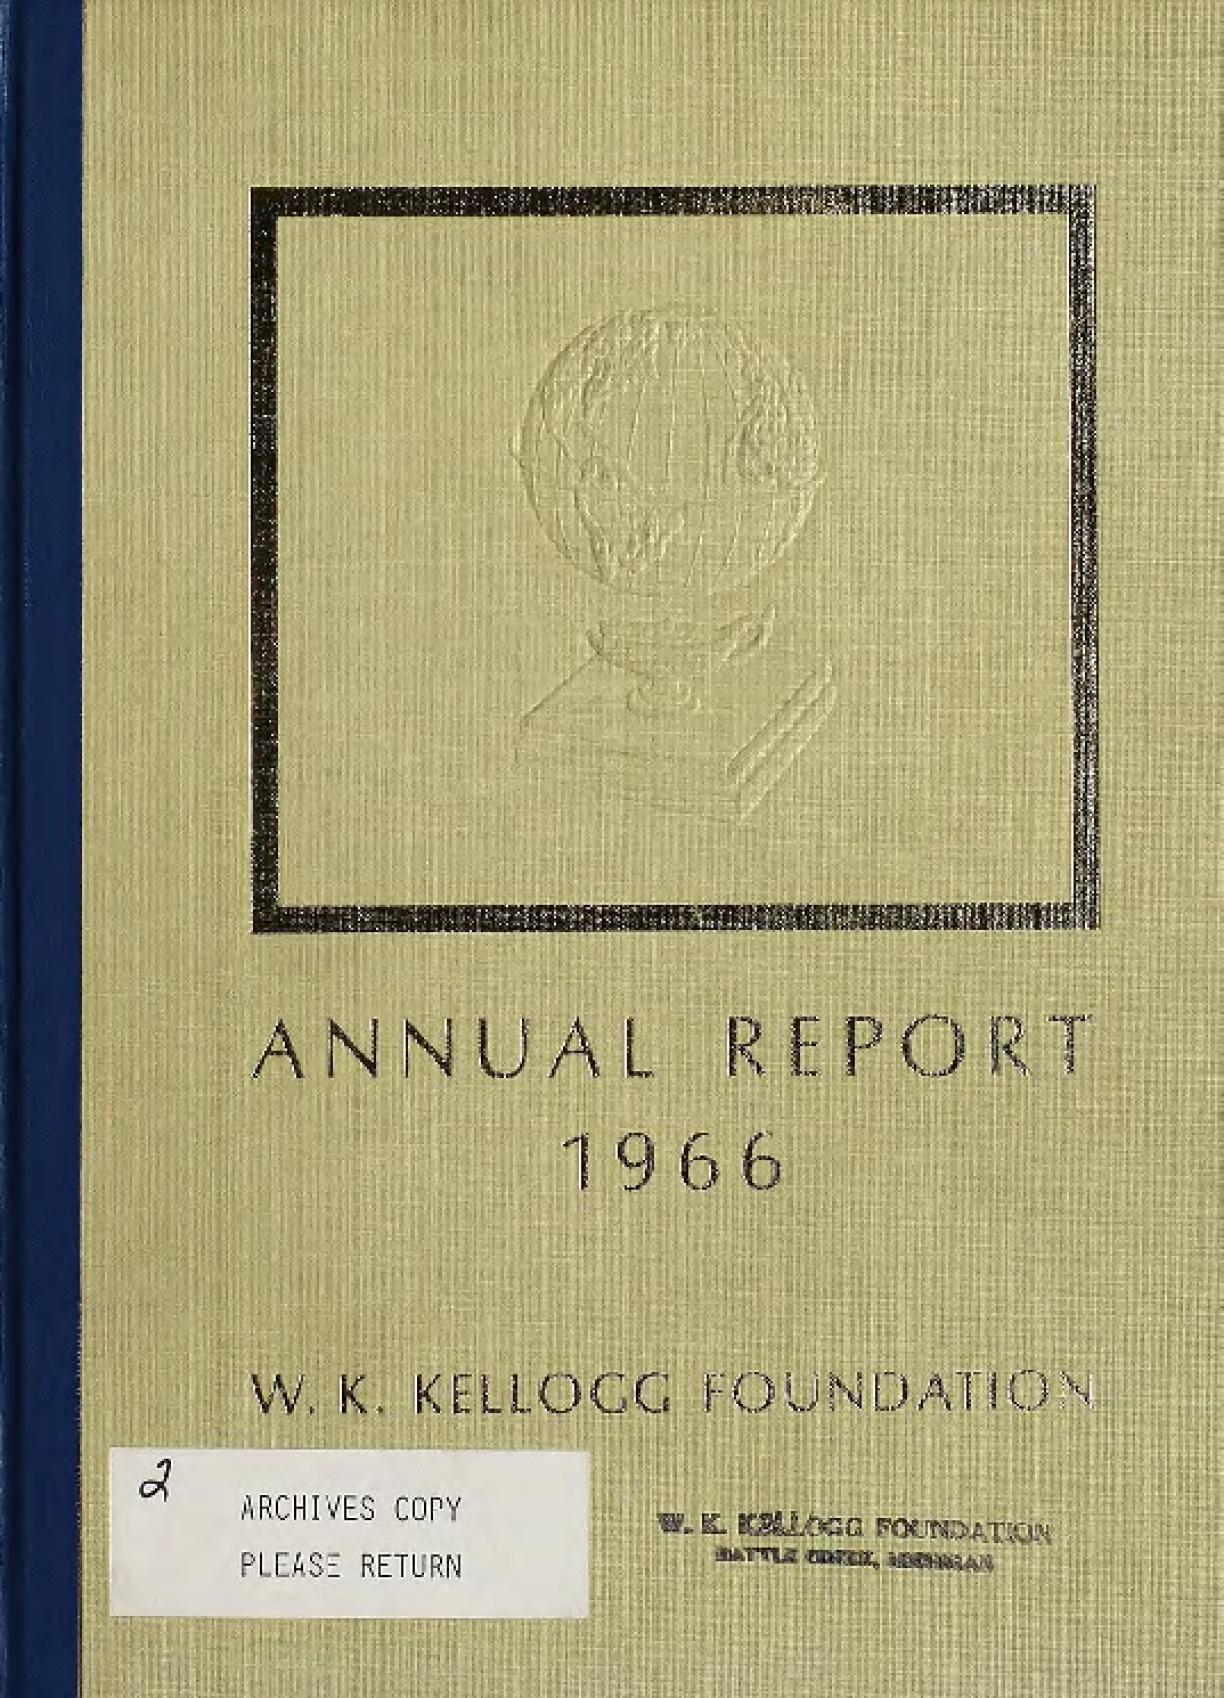 1966 W.K. Kellogg Foundation Annual Report